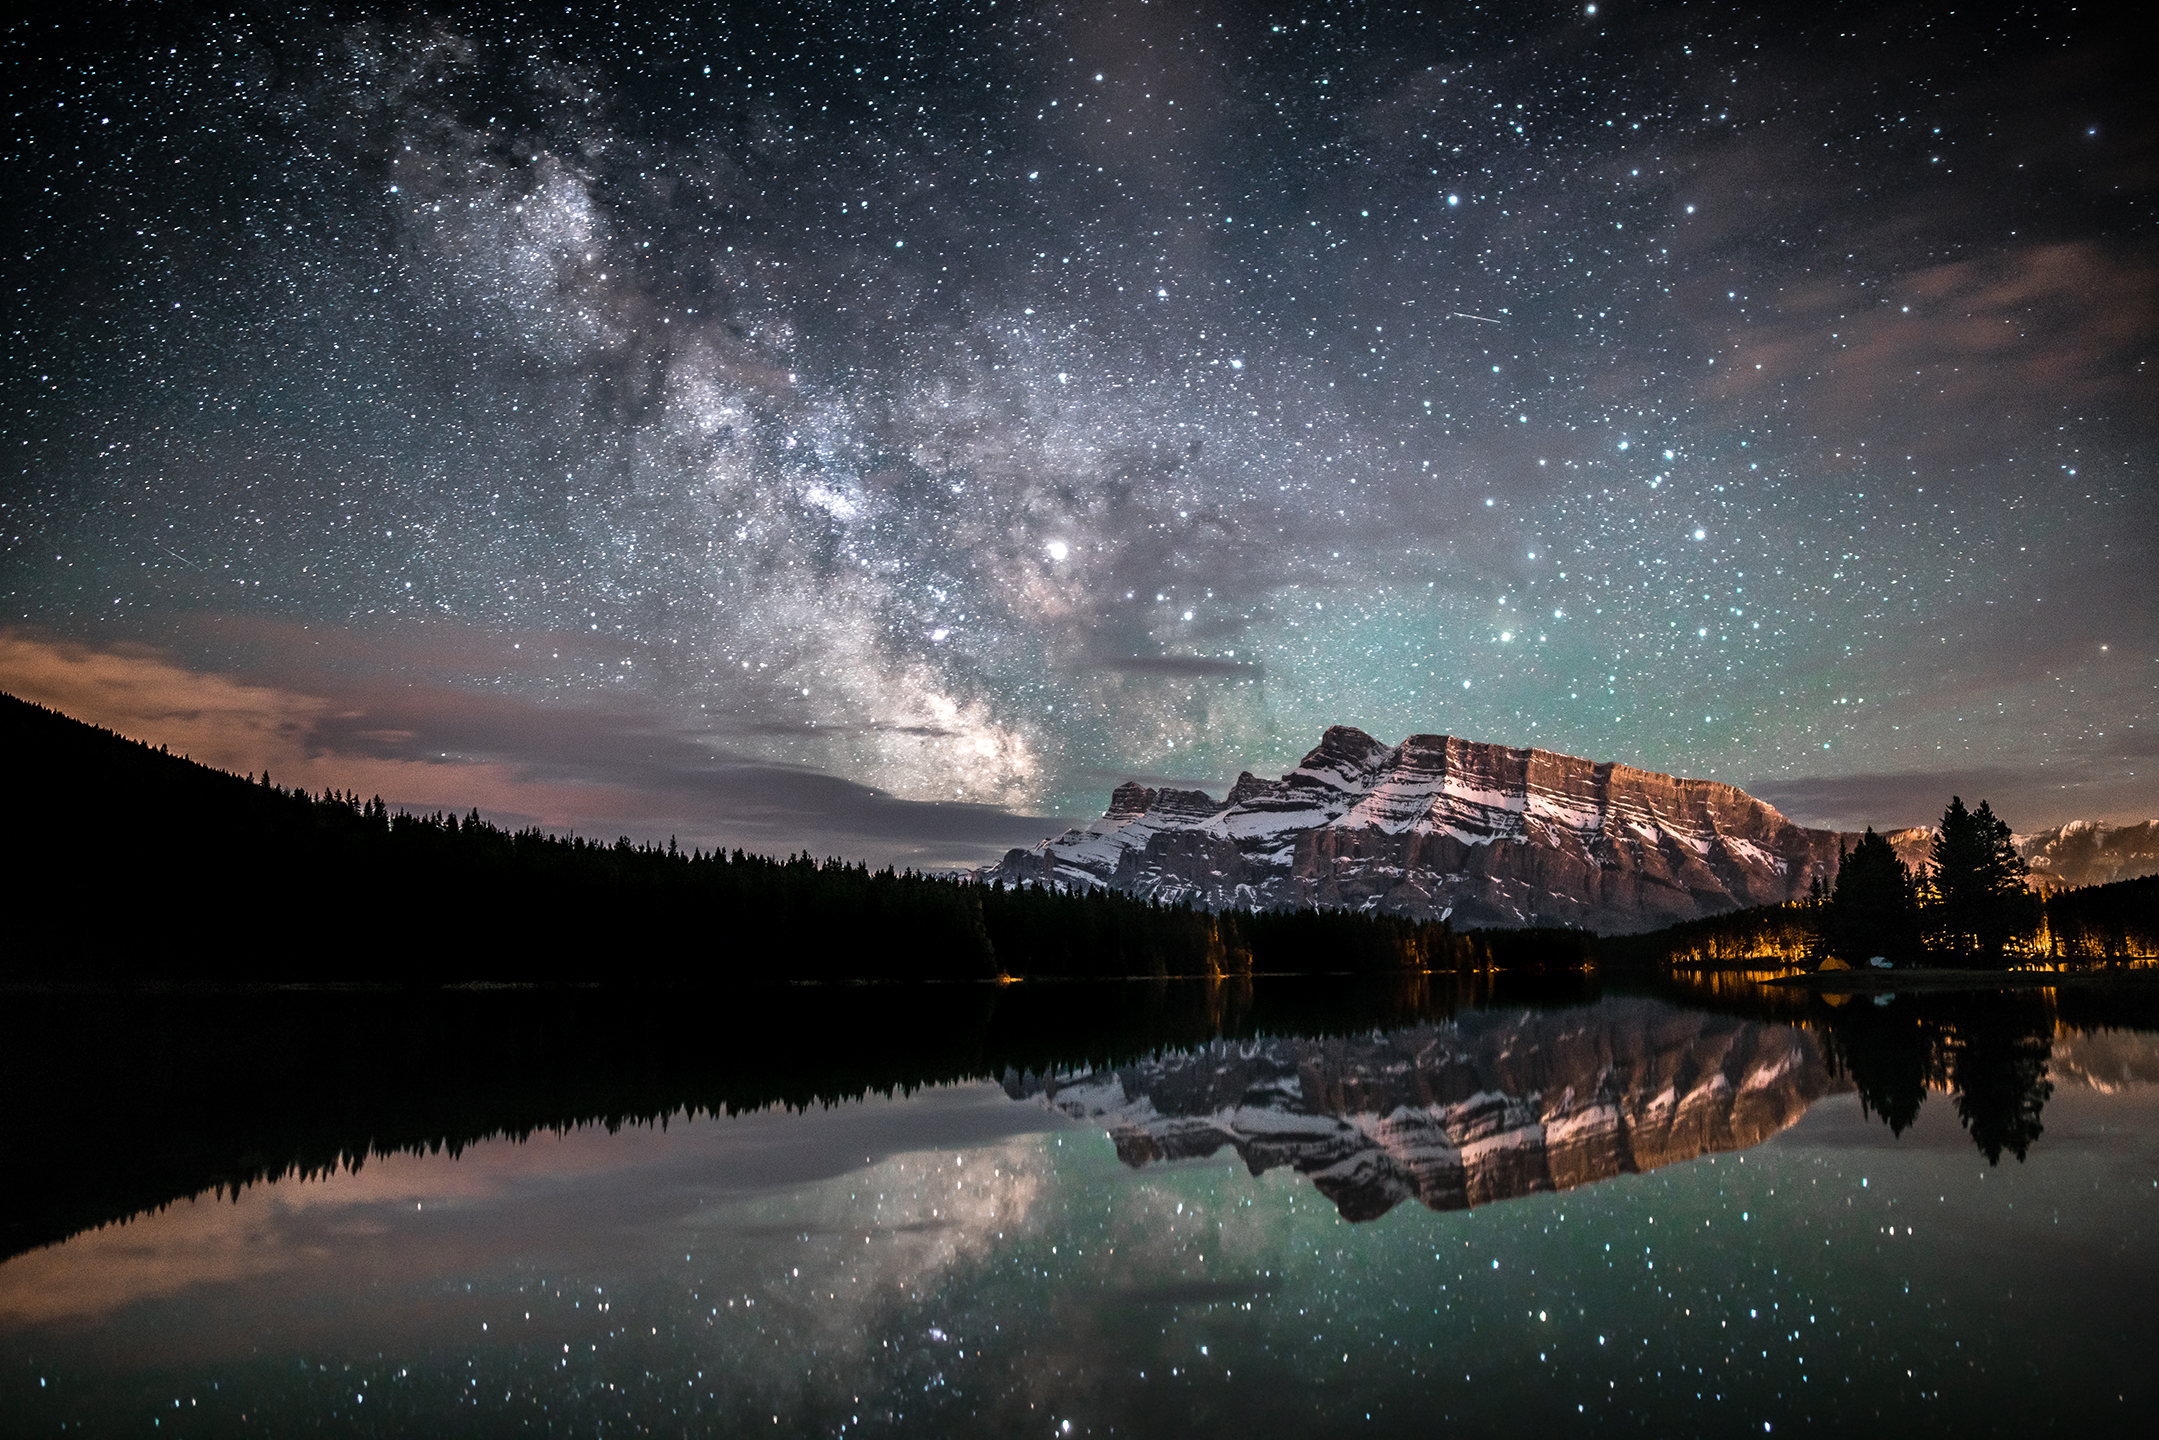 Two Jack Lake - Banff National Park, Alberta, Canada // Photographer: Jason Wilson // Sony a7R II + Rokinon 24mm f/1.4 // ISO 1000, f/1.4, 20